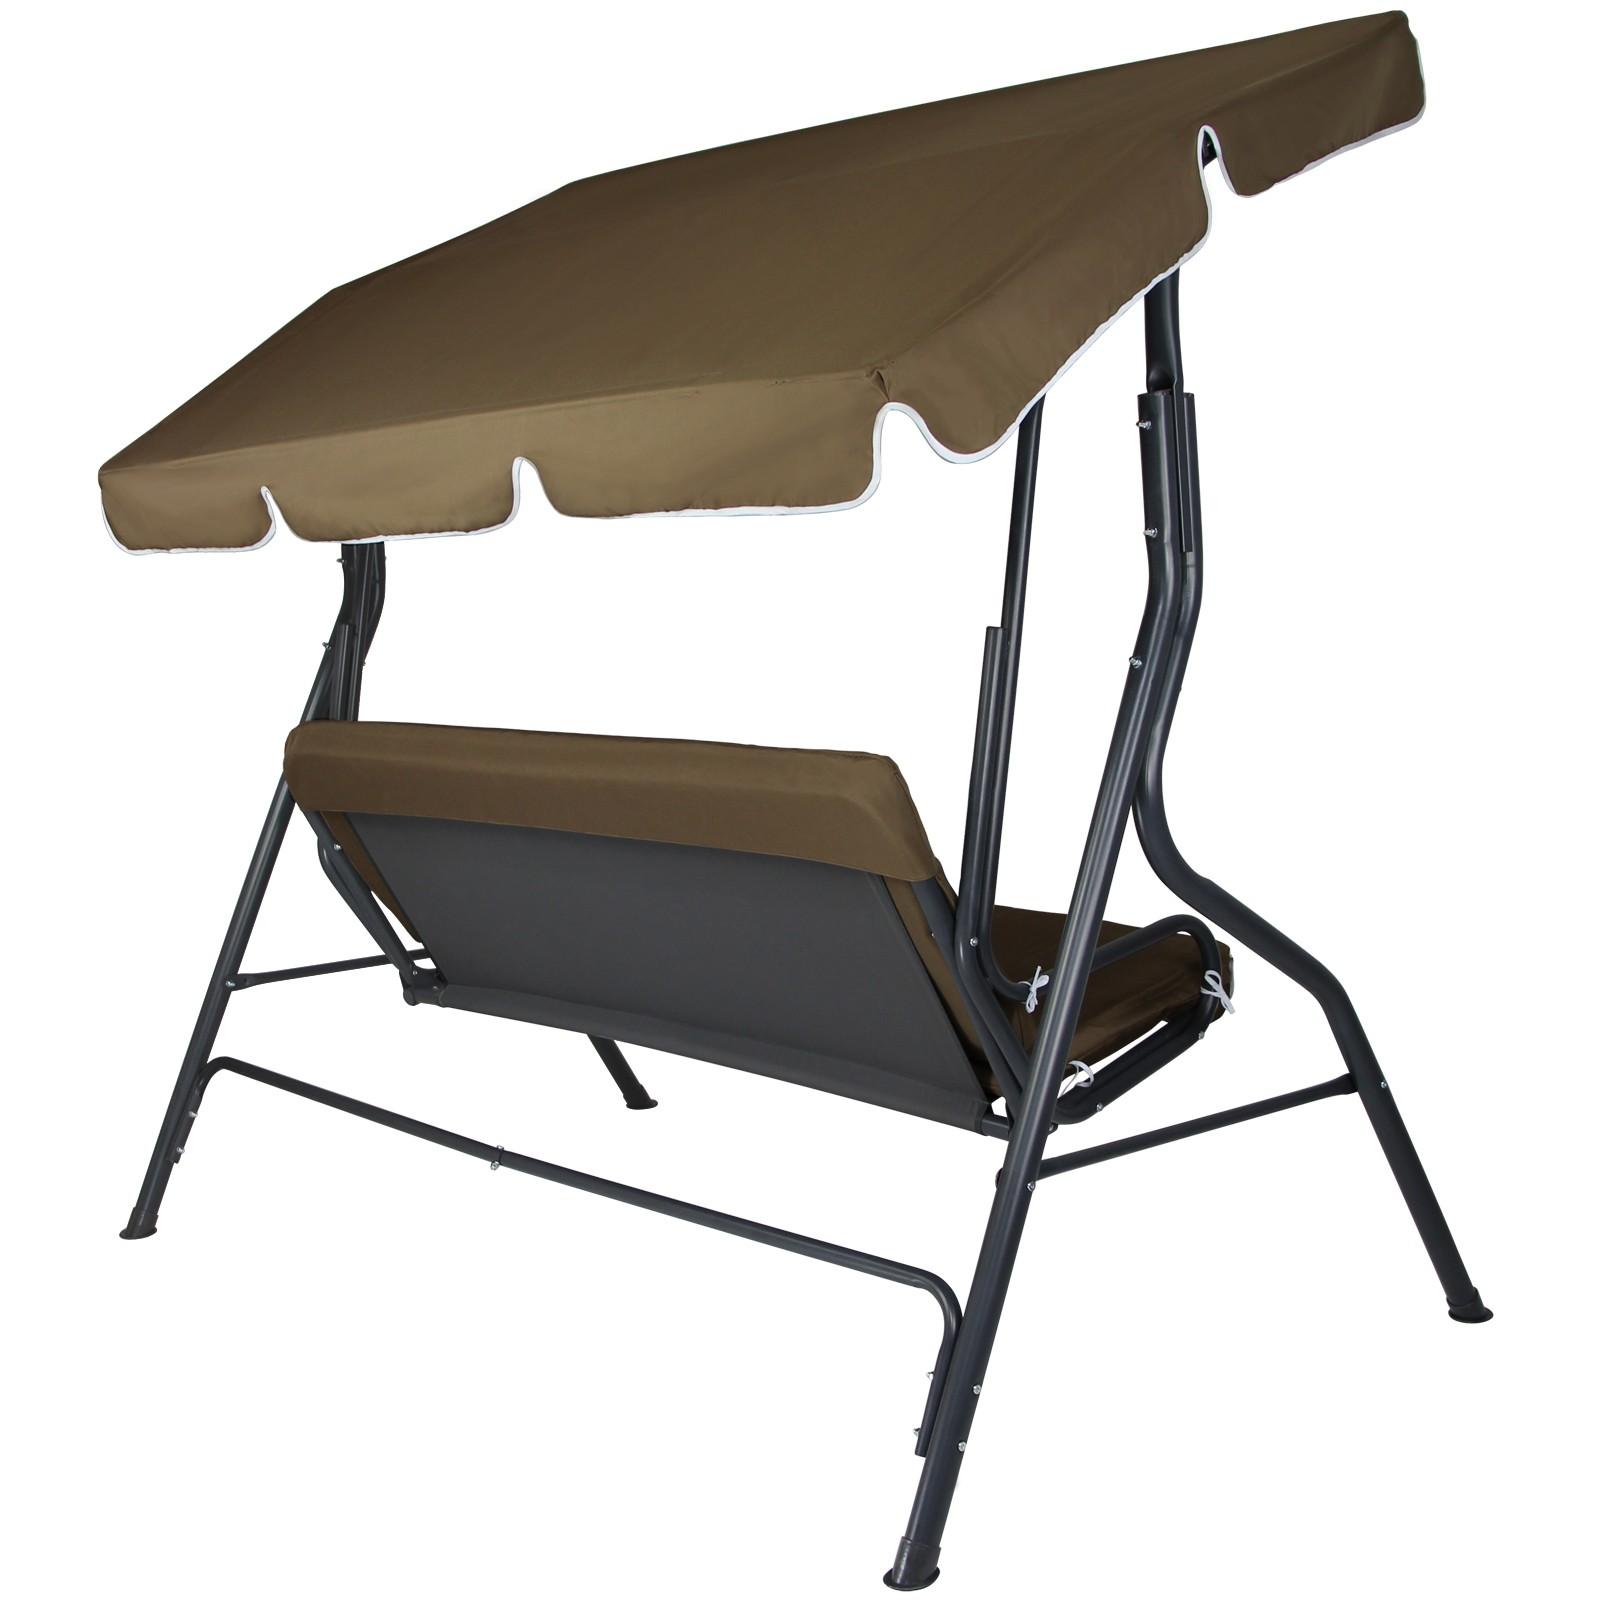 3 Seater Garden Hammock Swing Seat Cesena Patio Bench